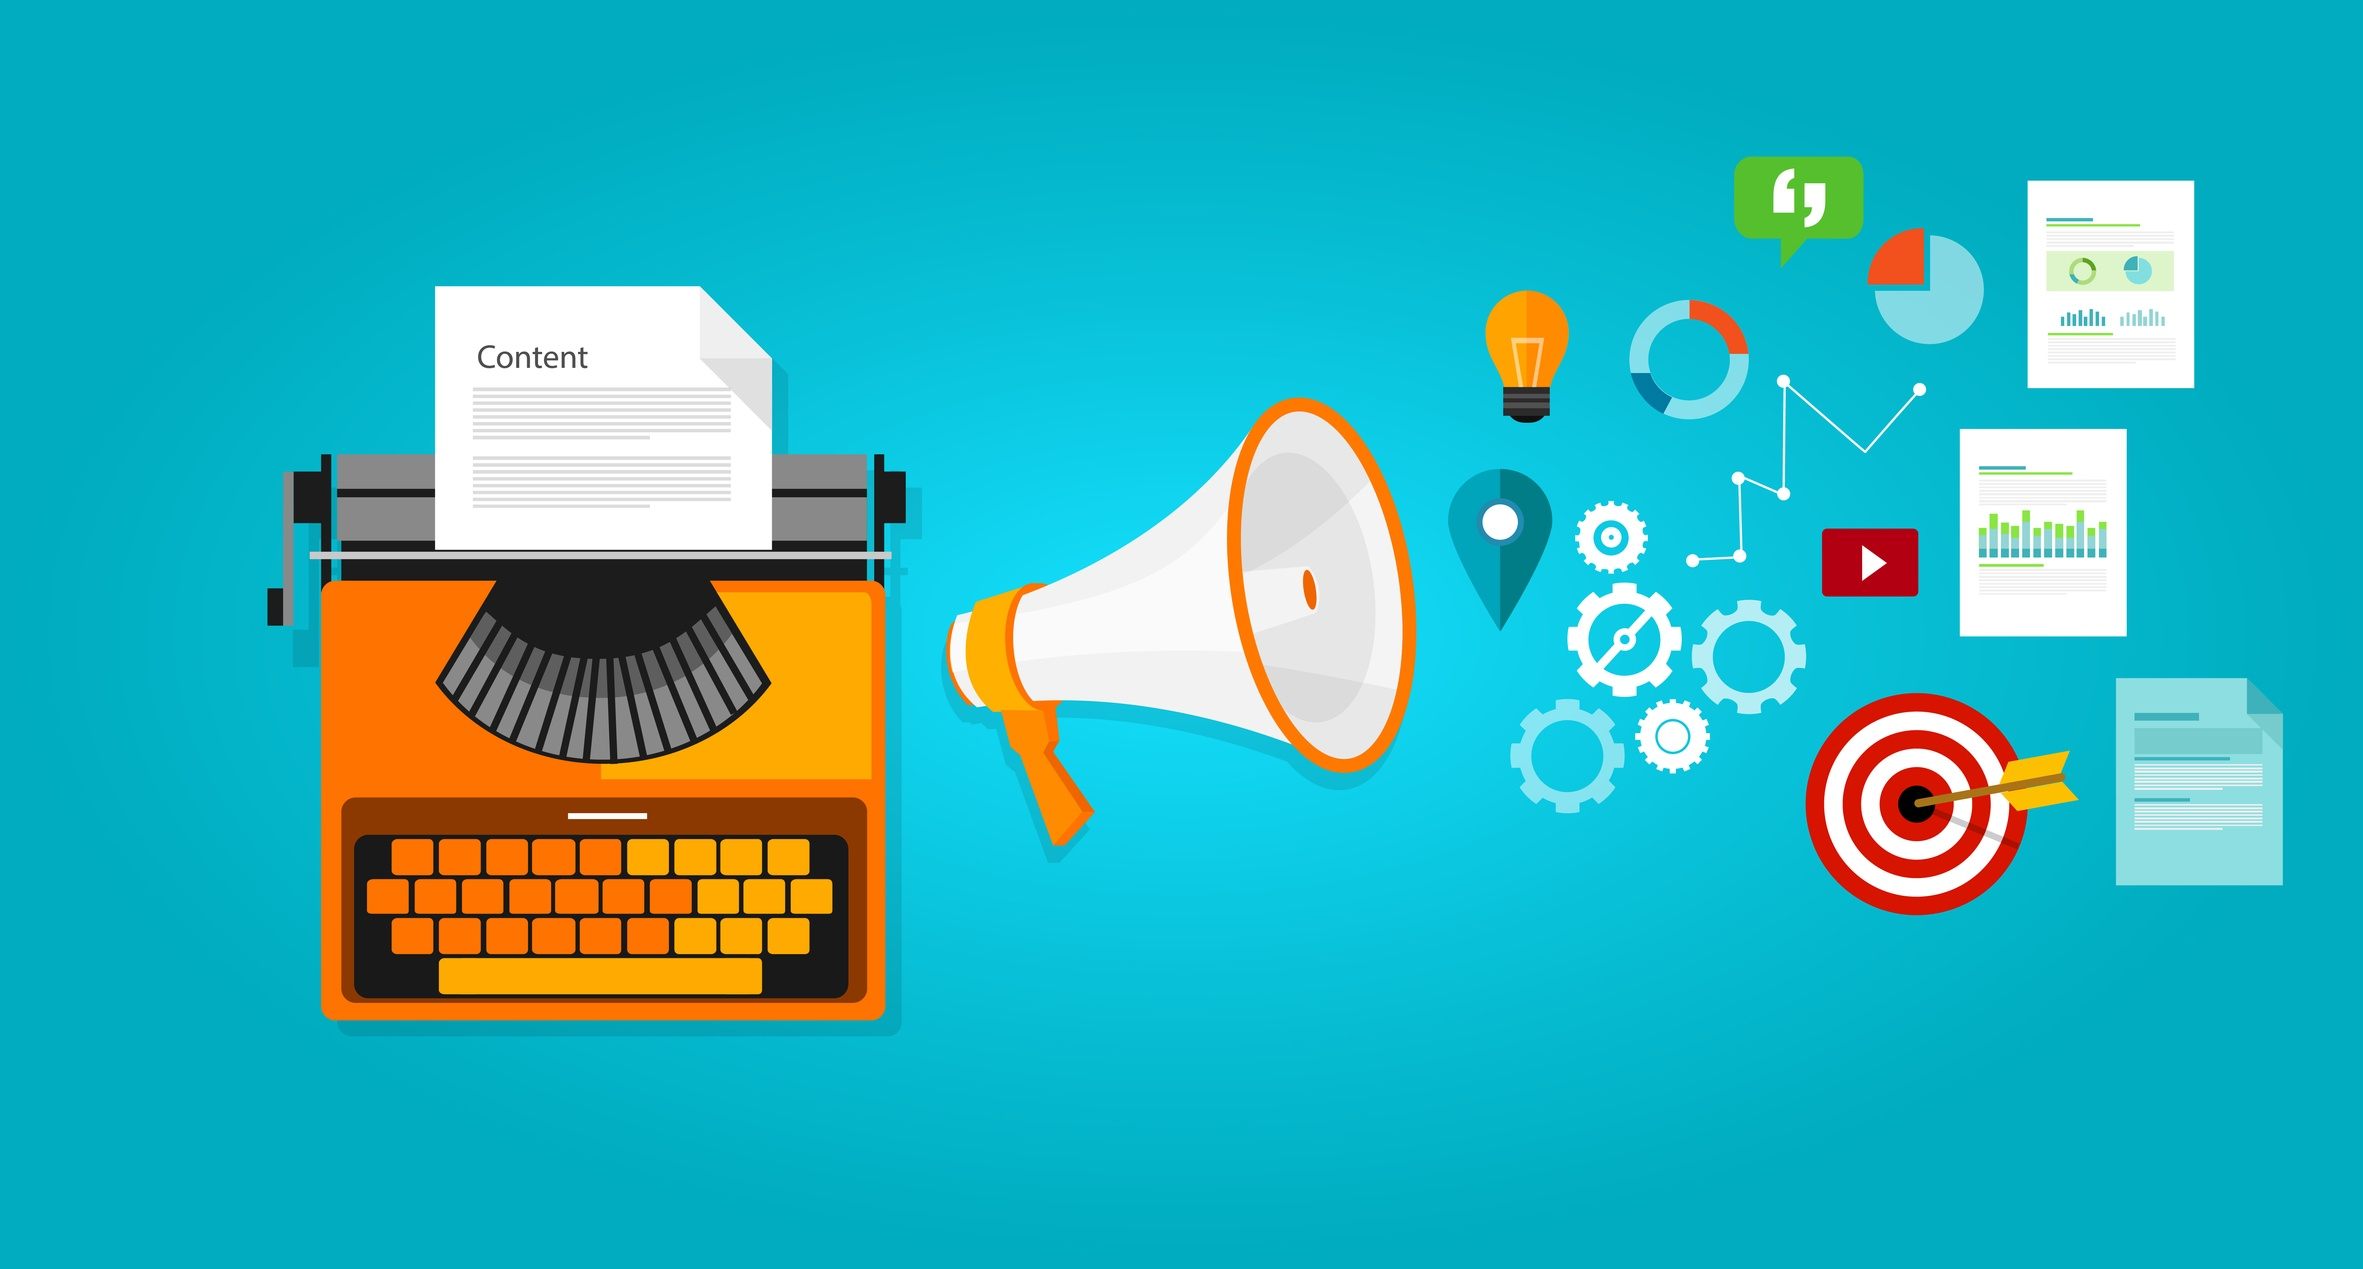 content-marketing-agenciia-digital-mexico.jpg